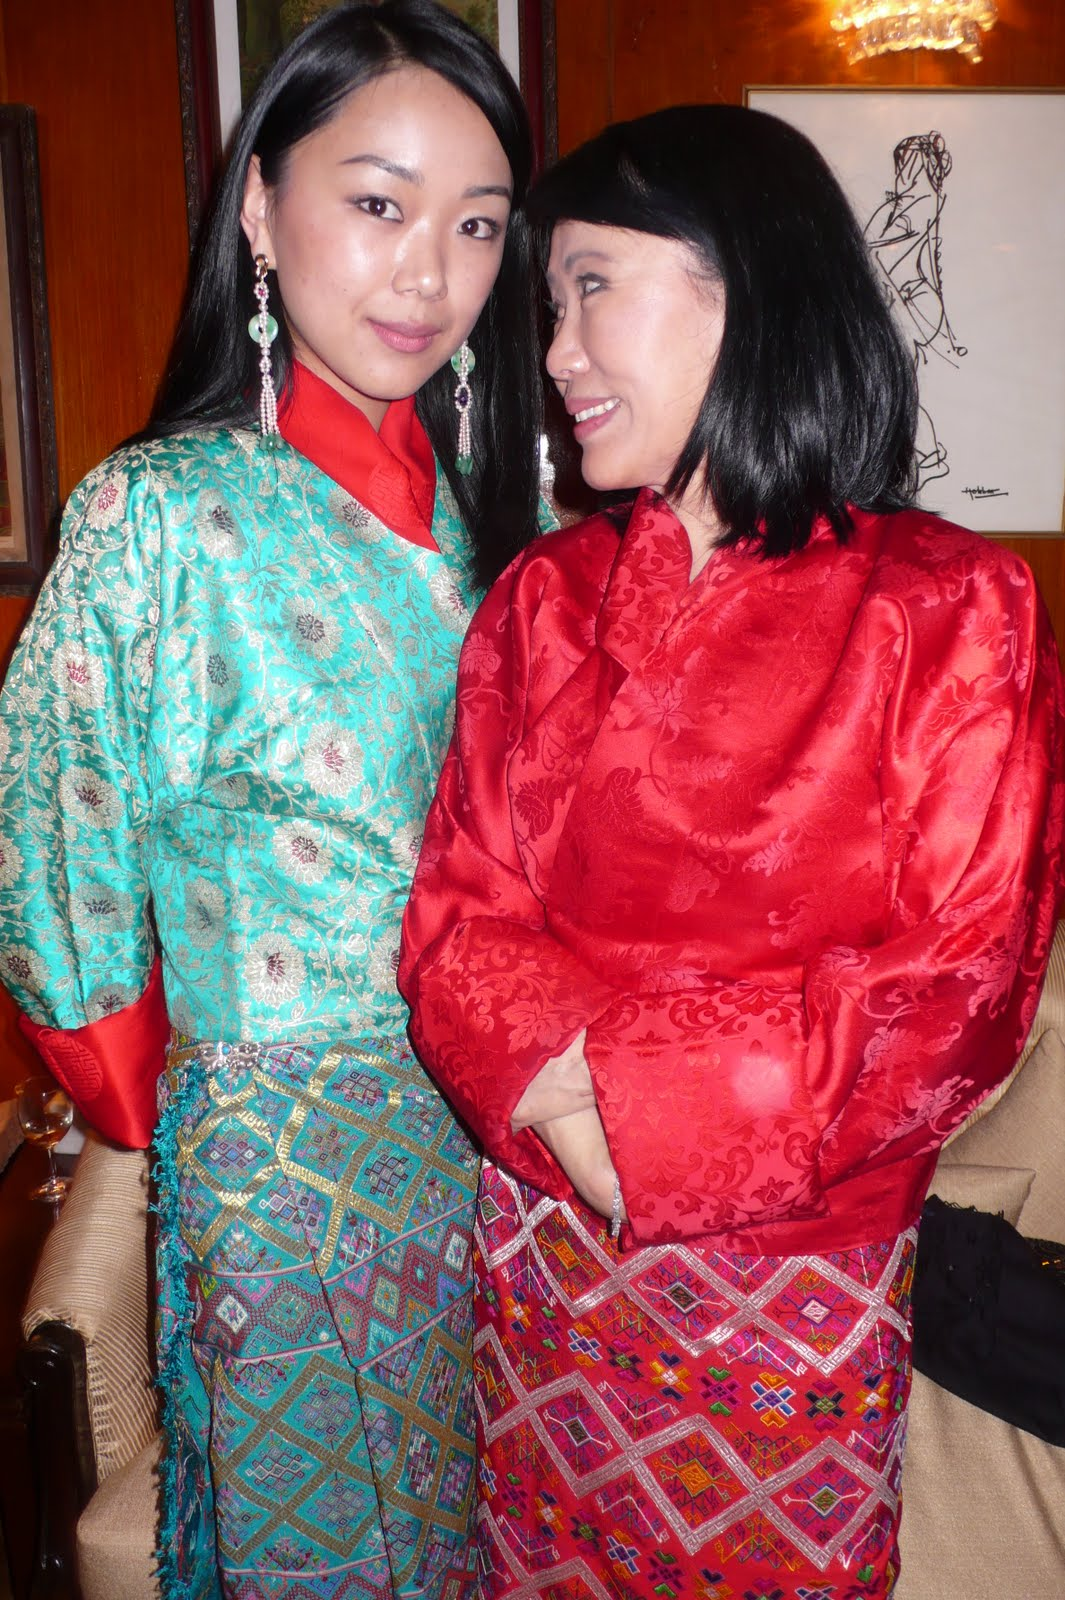 Bhutan women nude